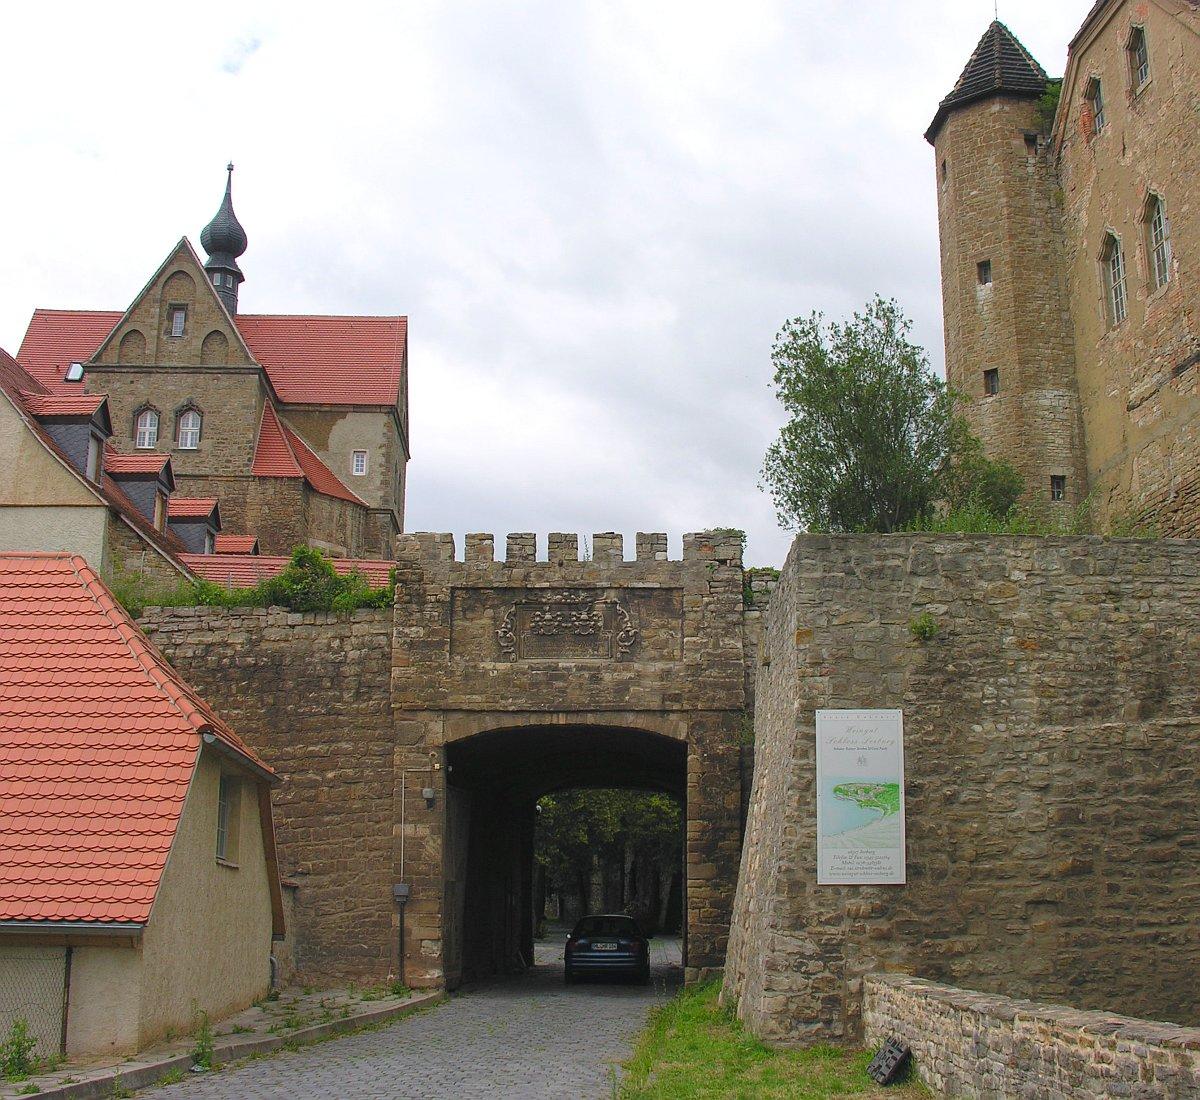 Seeburg Germany  city images : Schloss Seeburg Zufahrtstor mit Inschrift Wikimedia Commons